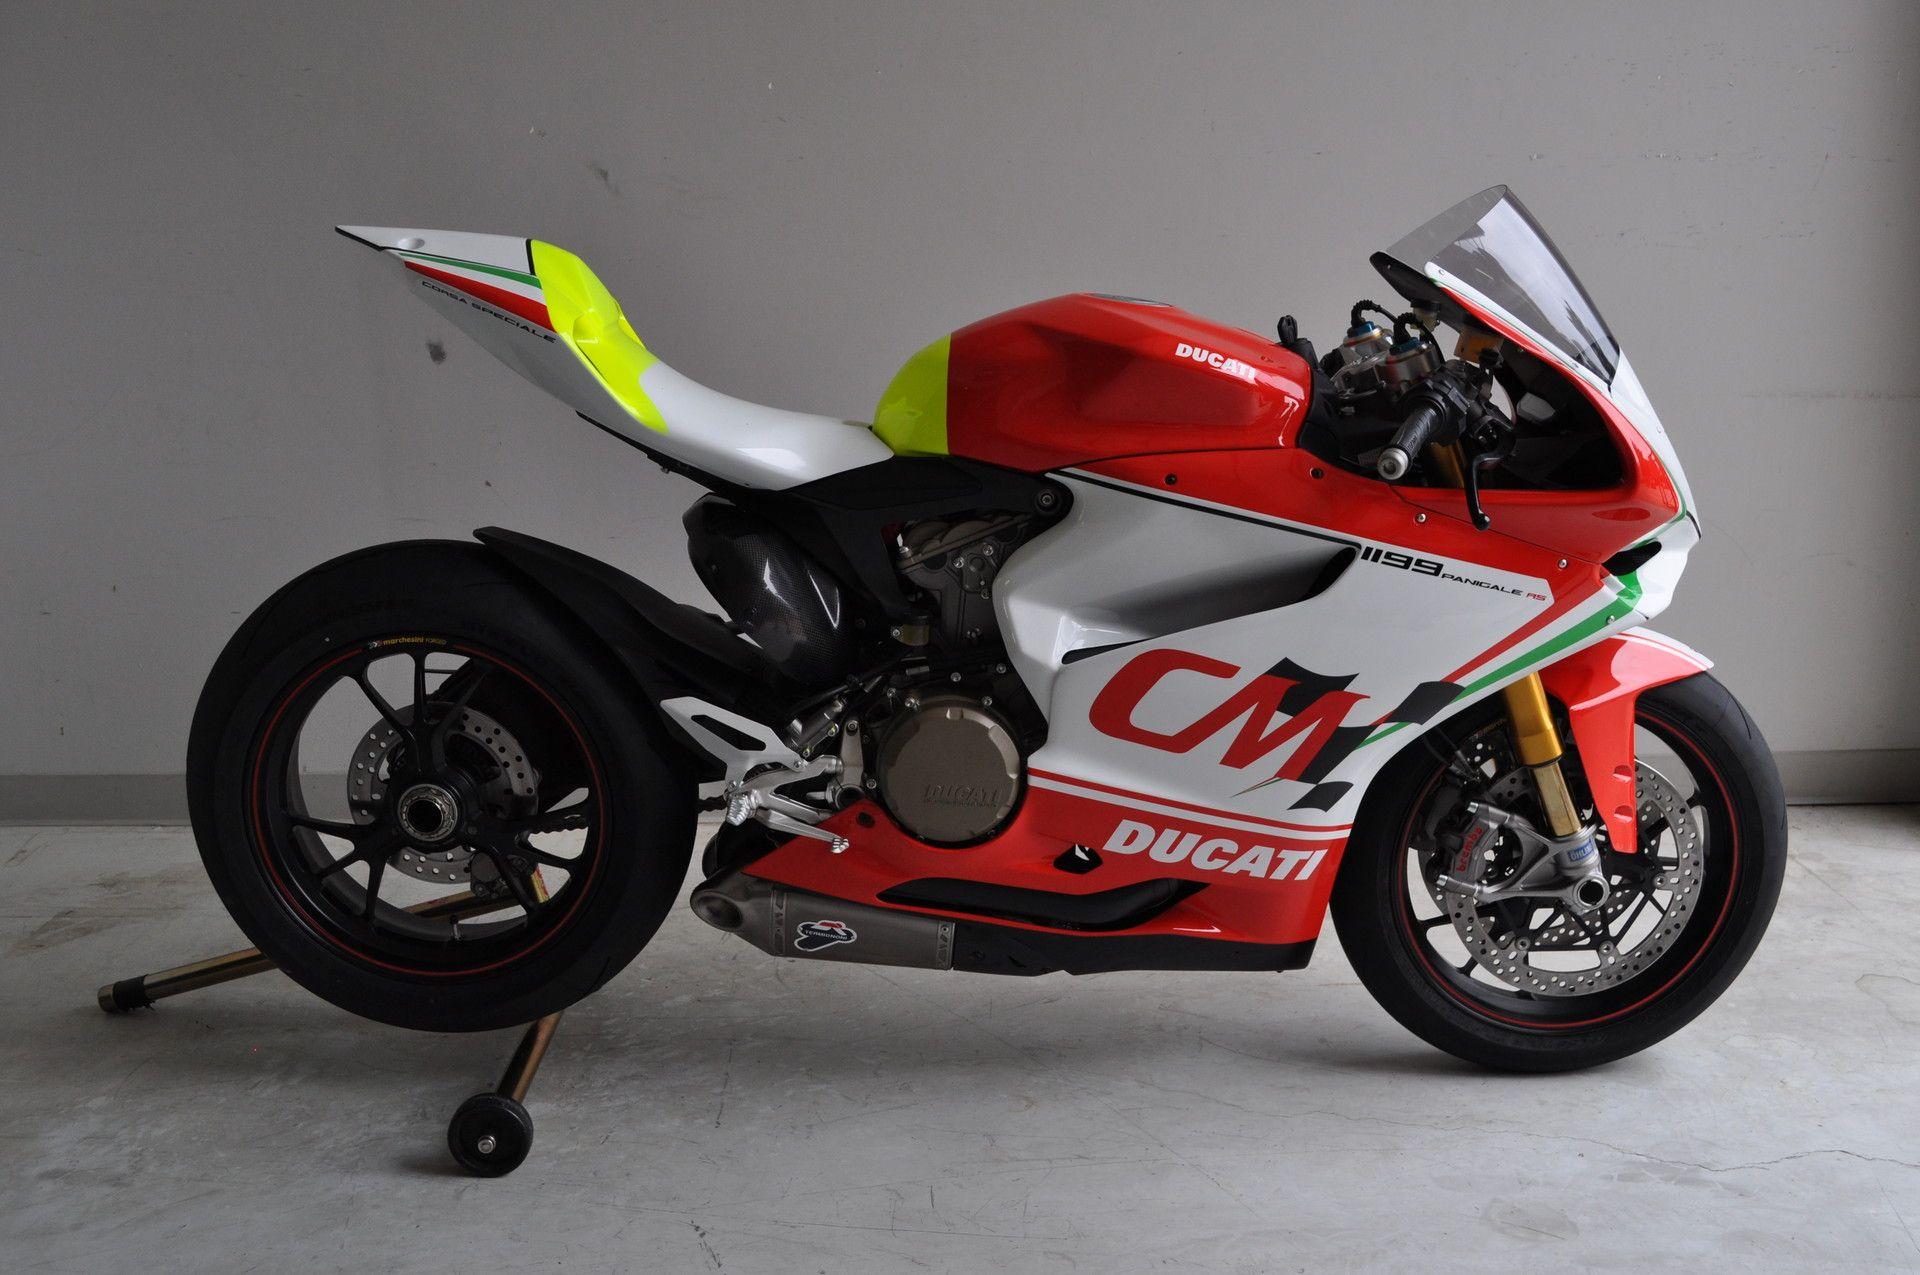 Ducati 1198s Racing Sport Bike: Ducati 1199 Panigale RS